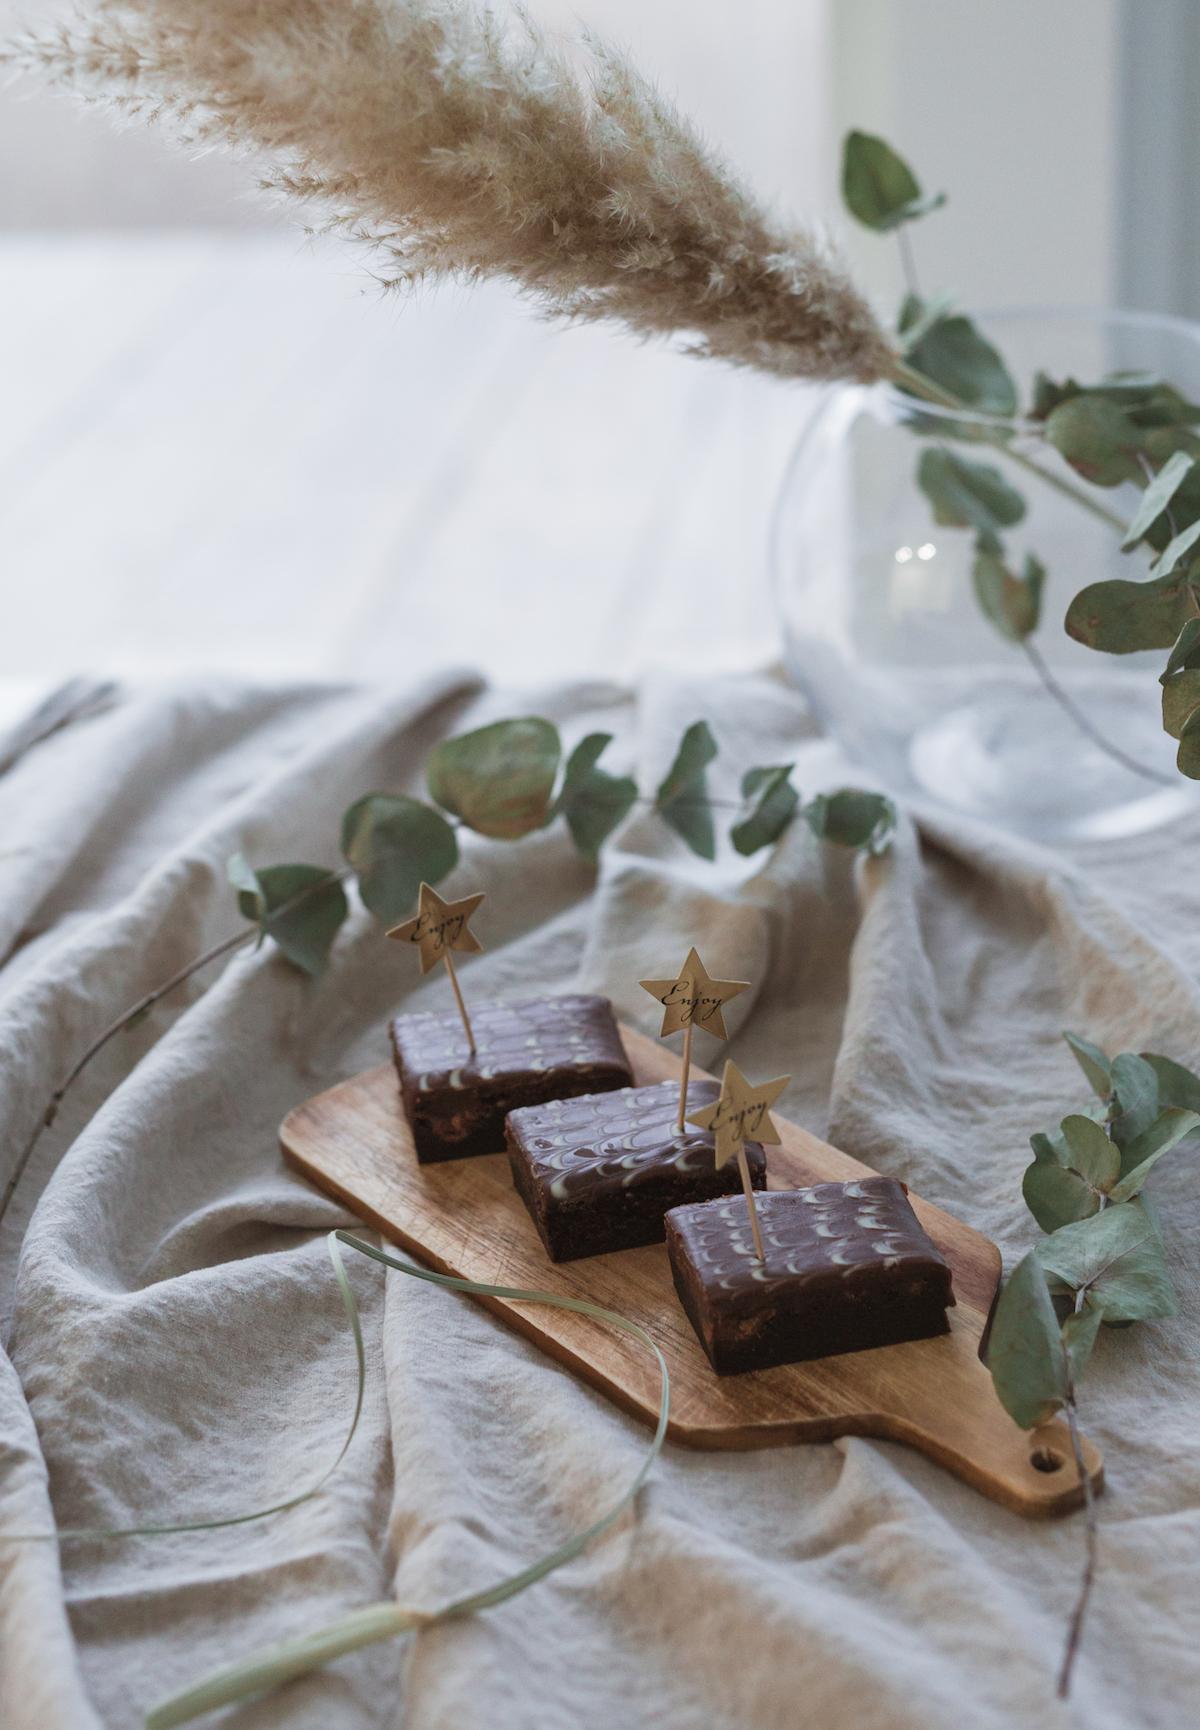 Minttusuklaa-brownies